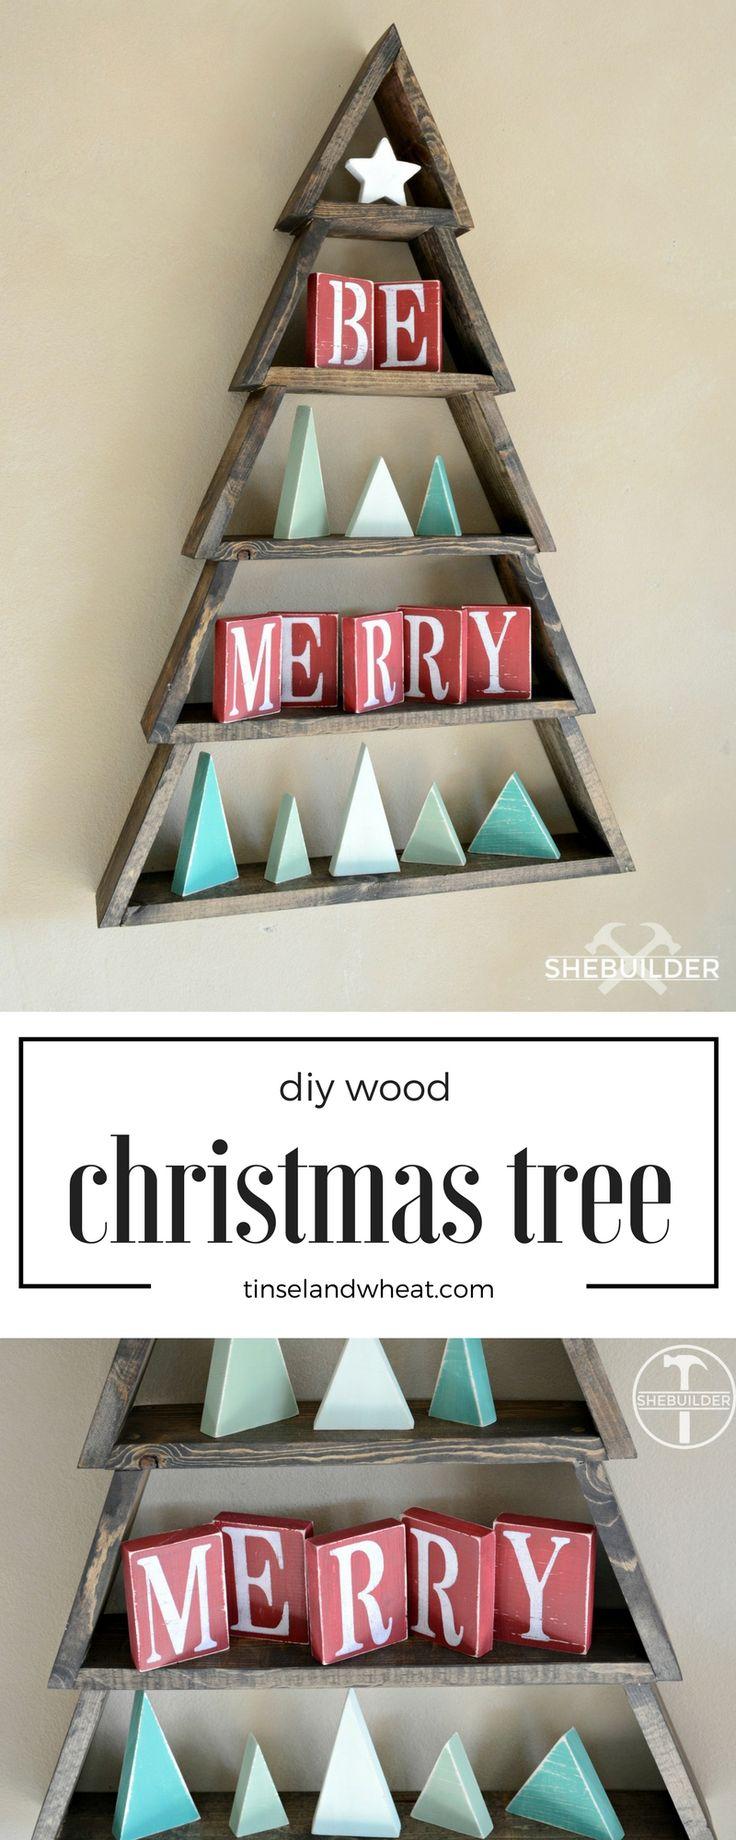 Wooden craft christmas trees - Diy Wood Christmas Tree